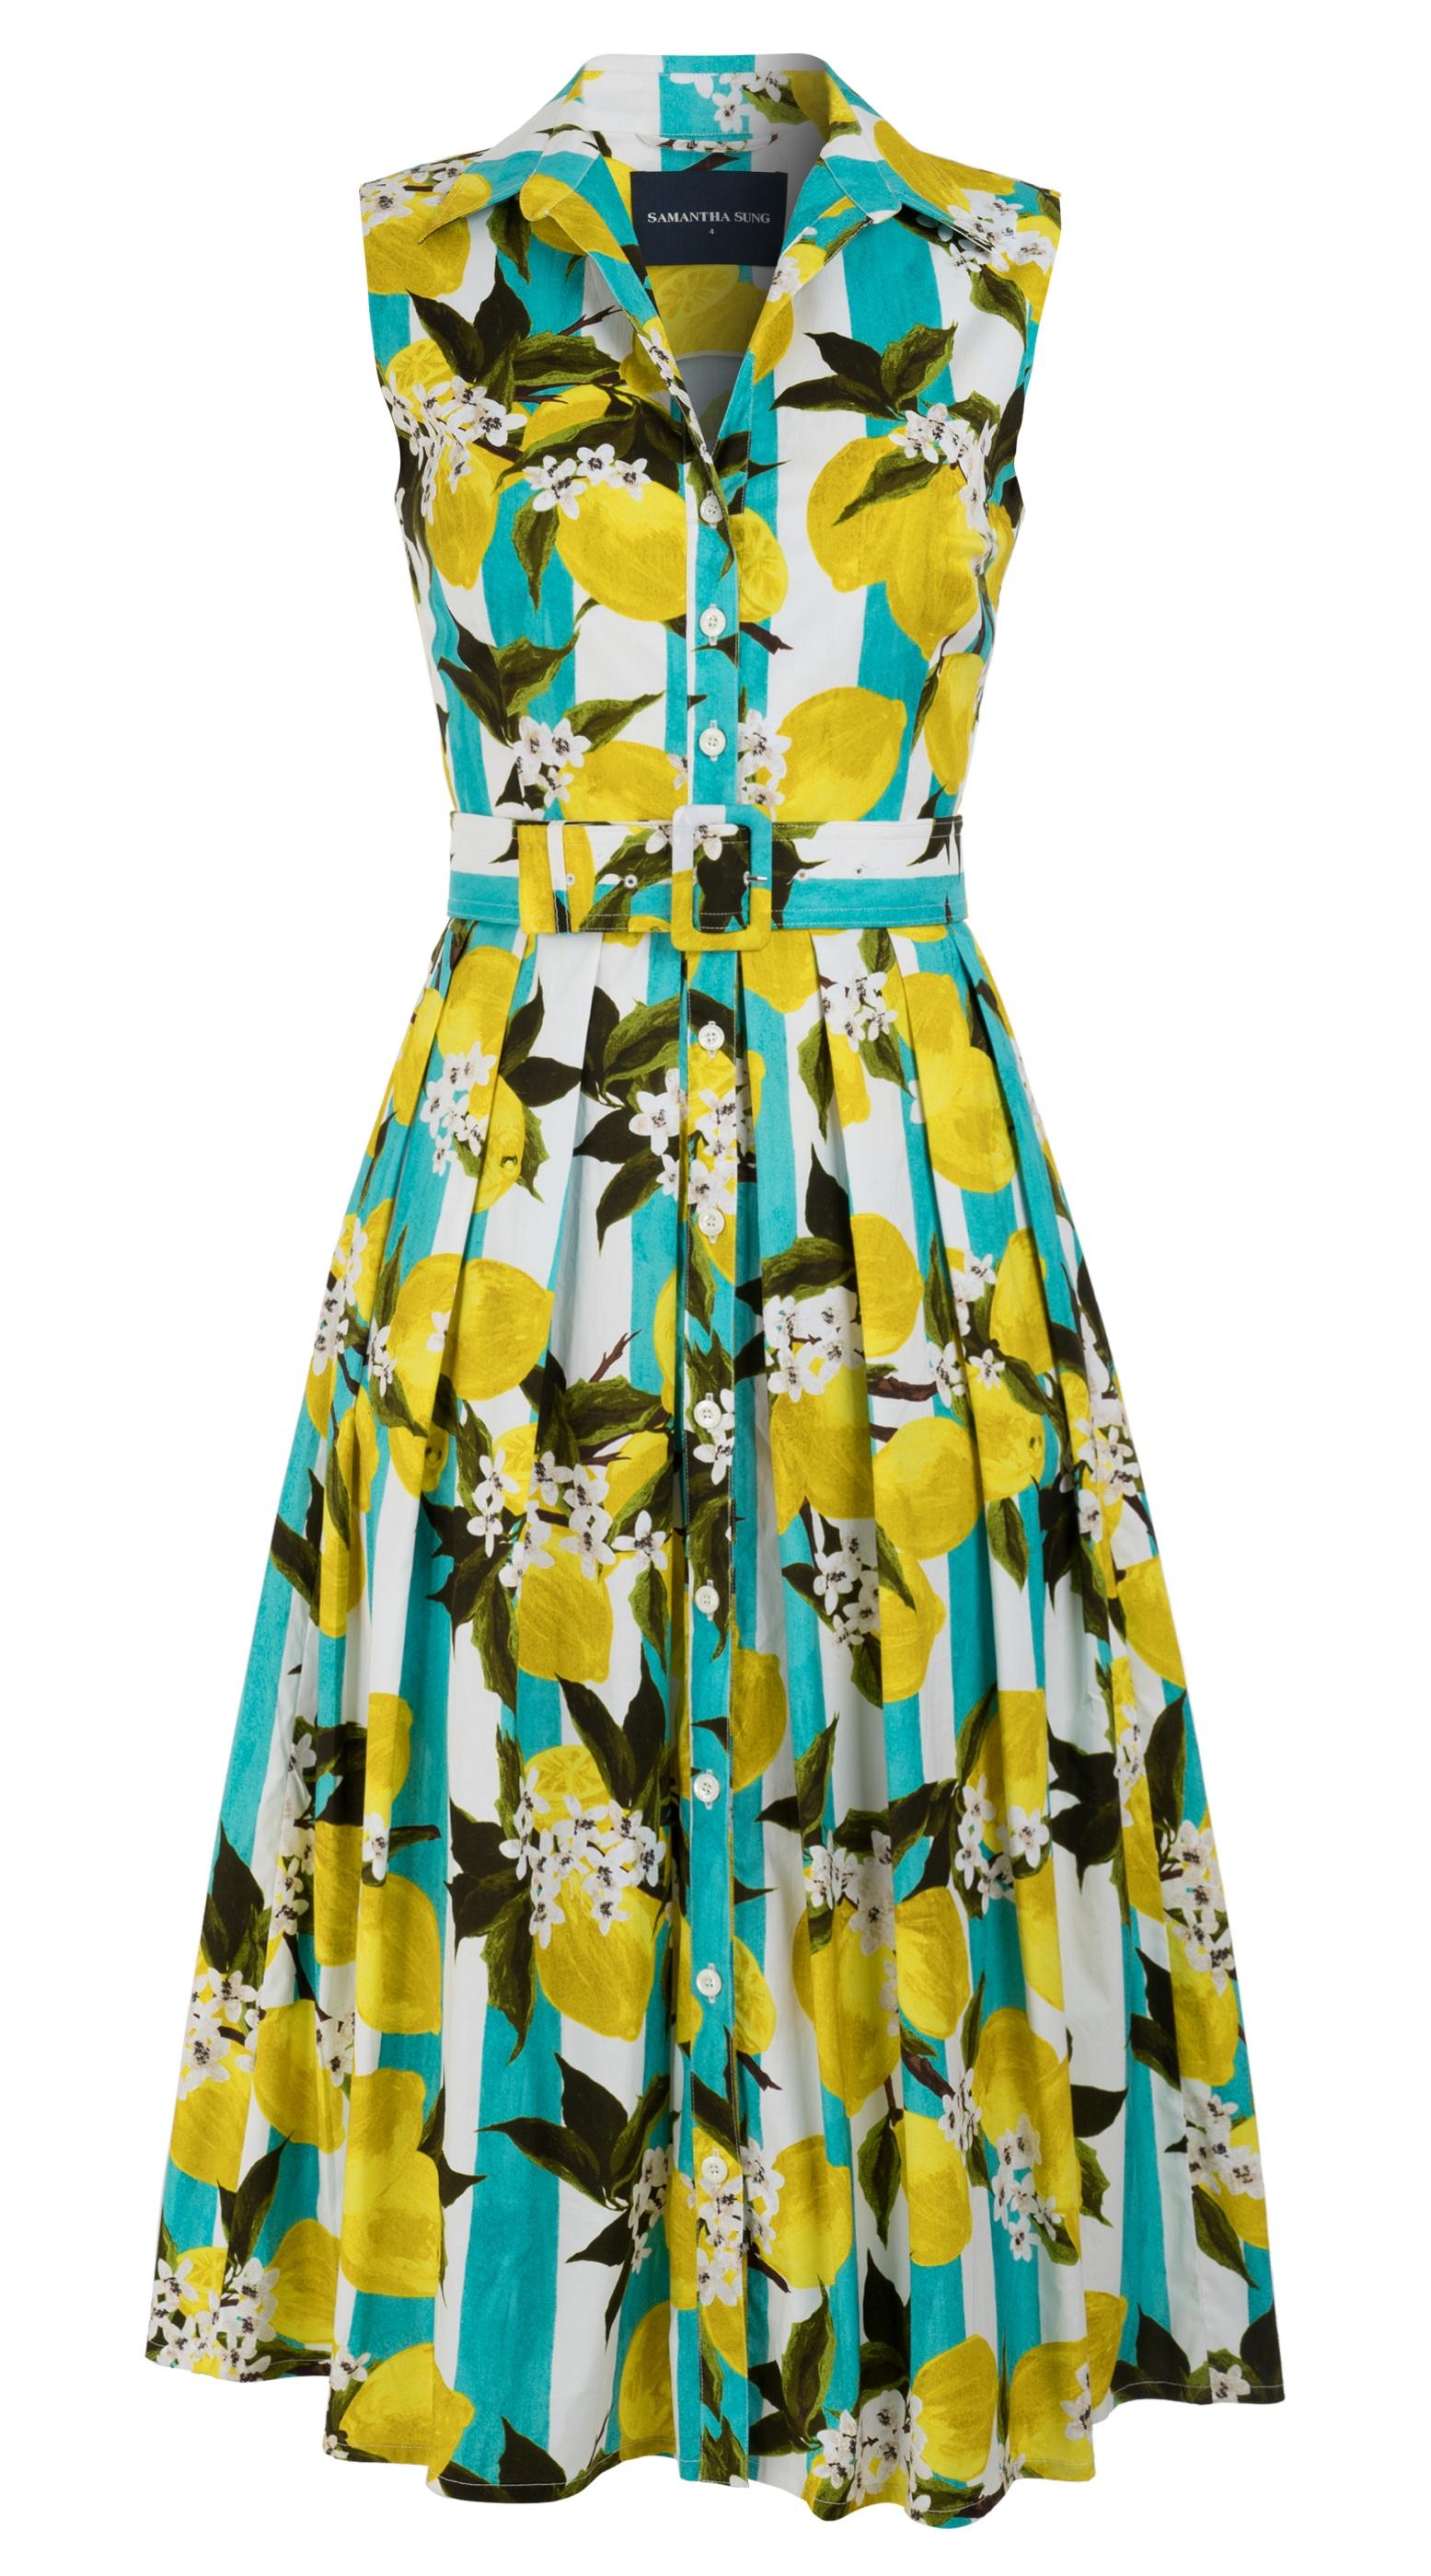 Lemon Stripe_Aqua Yellow_Audrey Dress #1 Shirt Collar Sleeveless_Midi_CS_Front-2